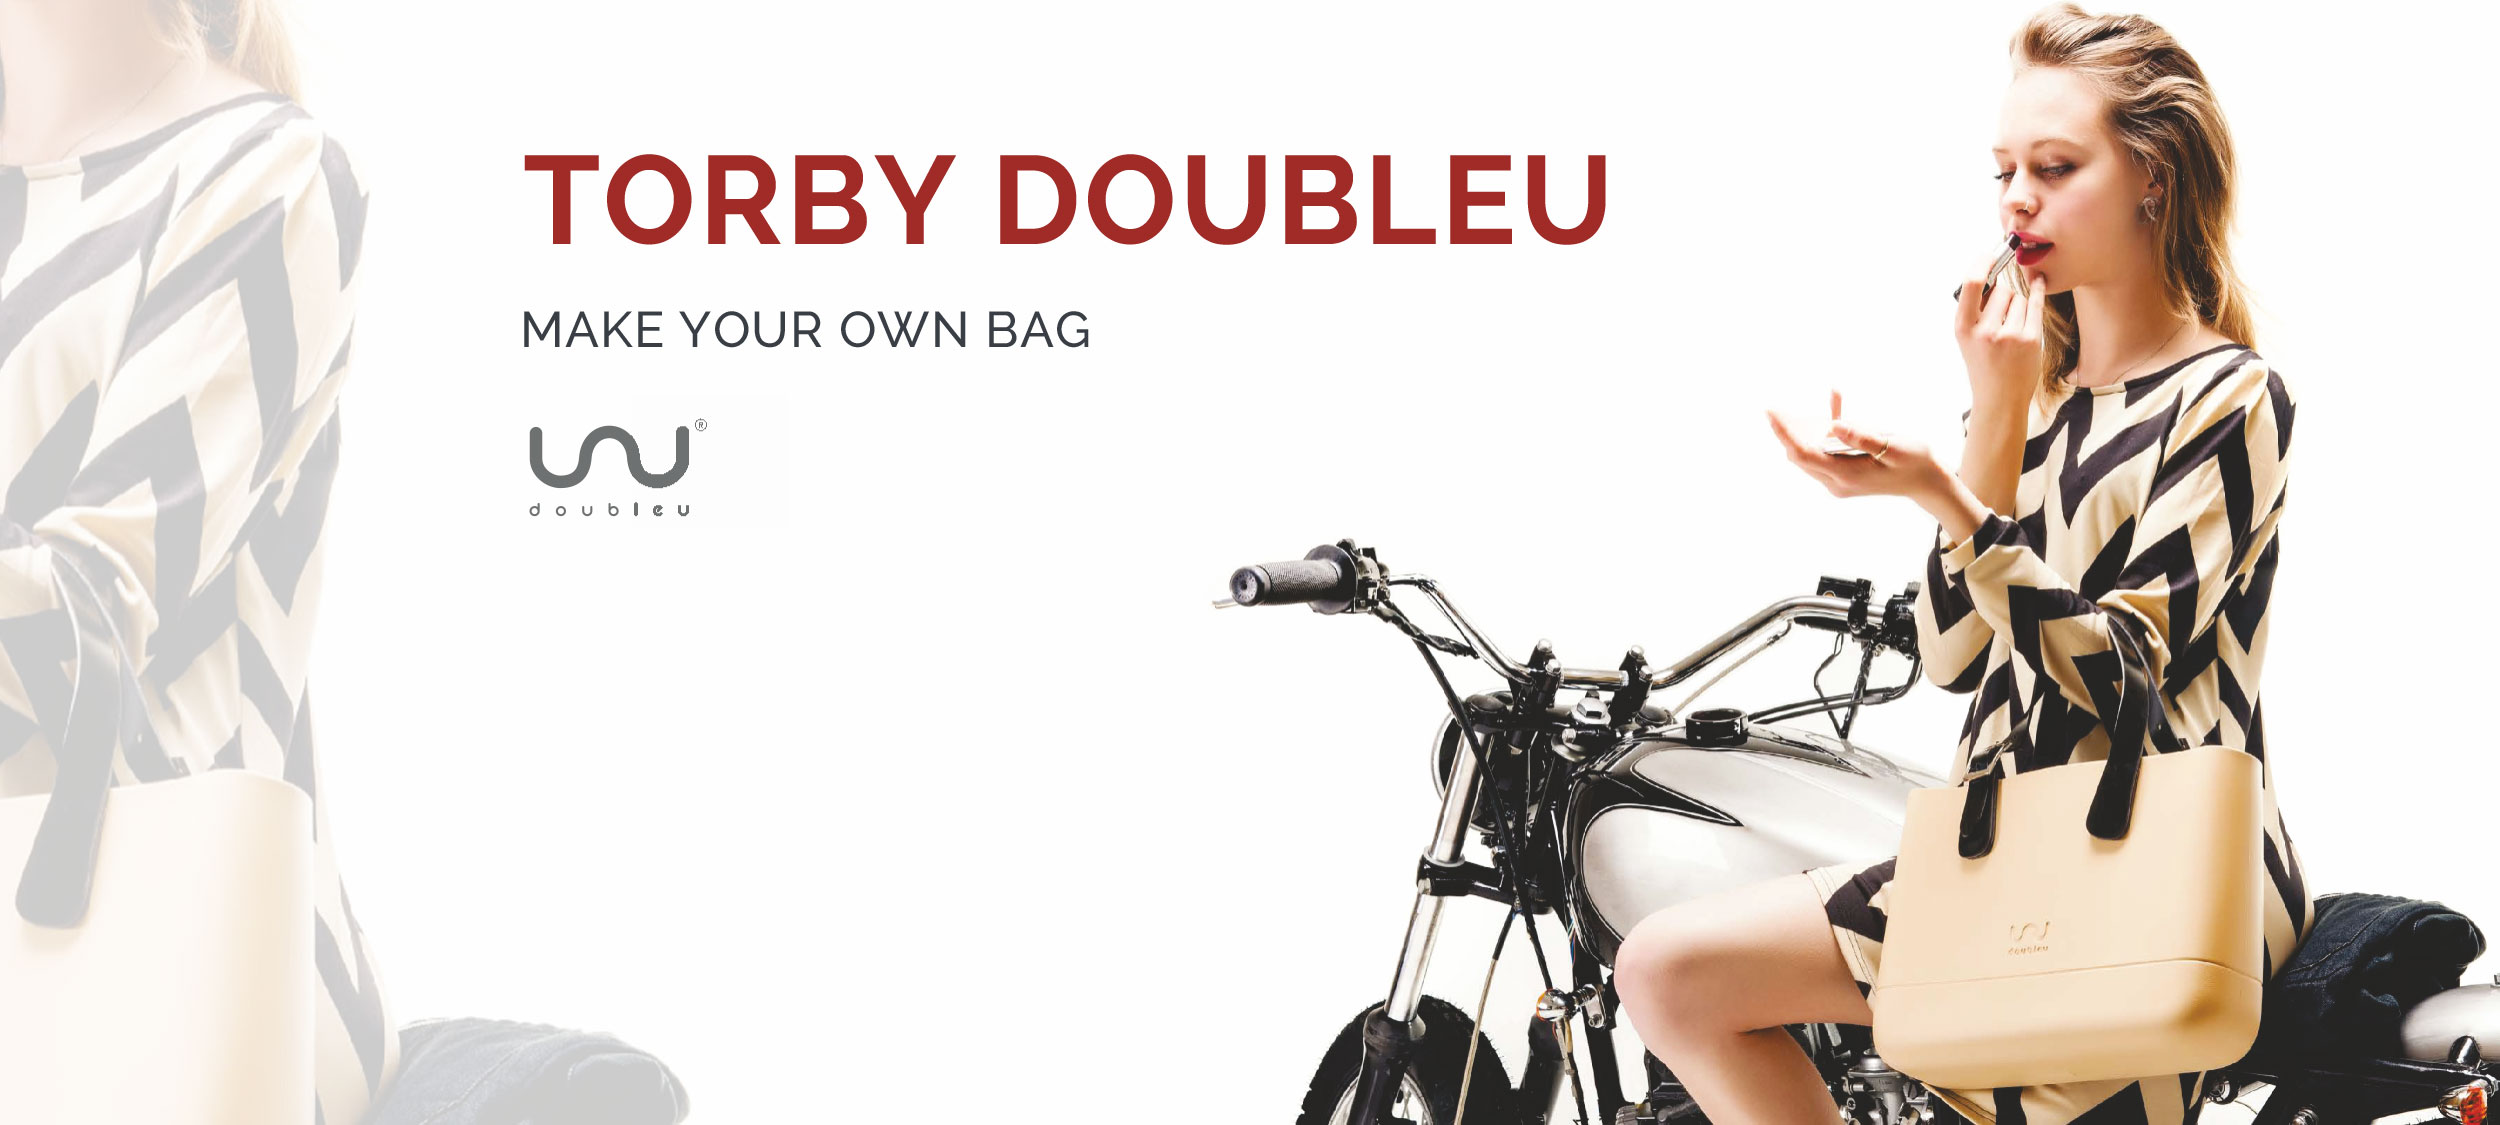 torby_dubleu